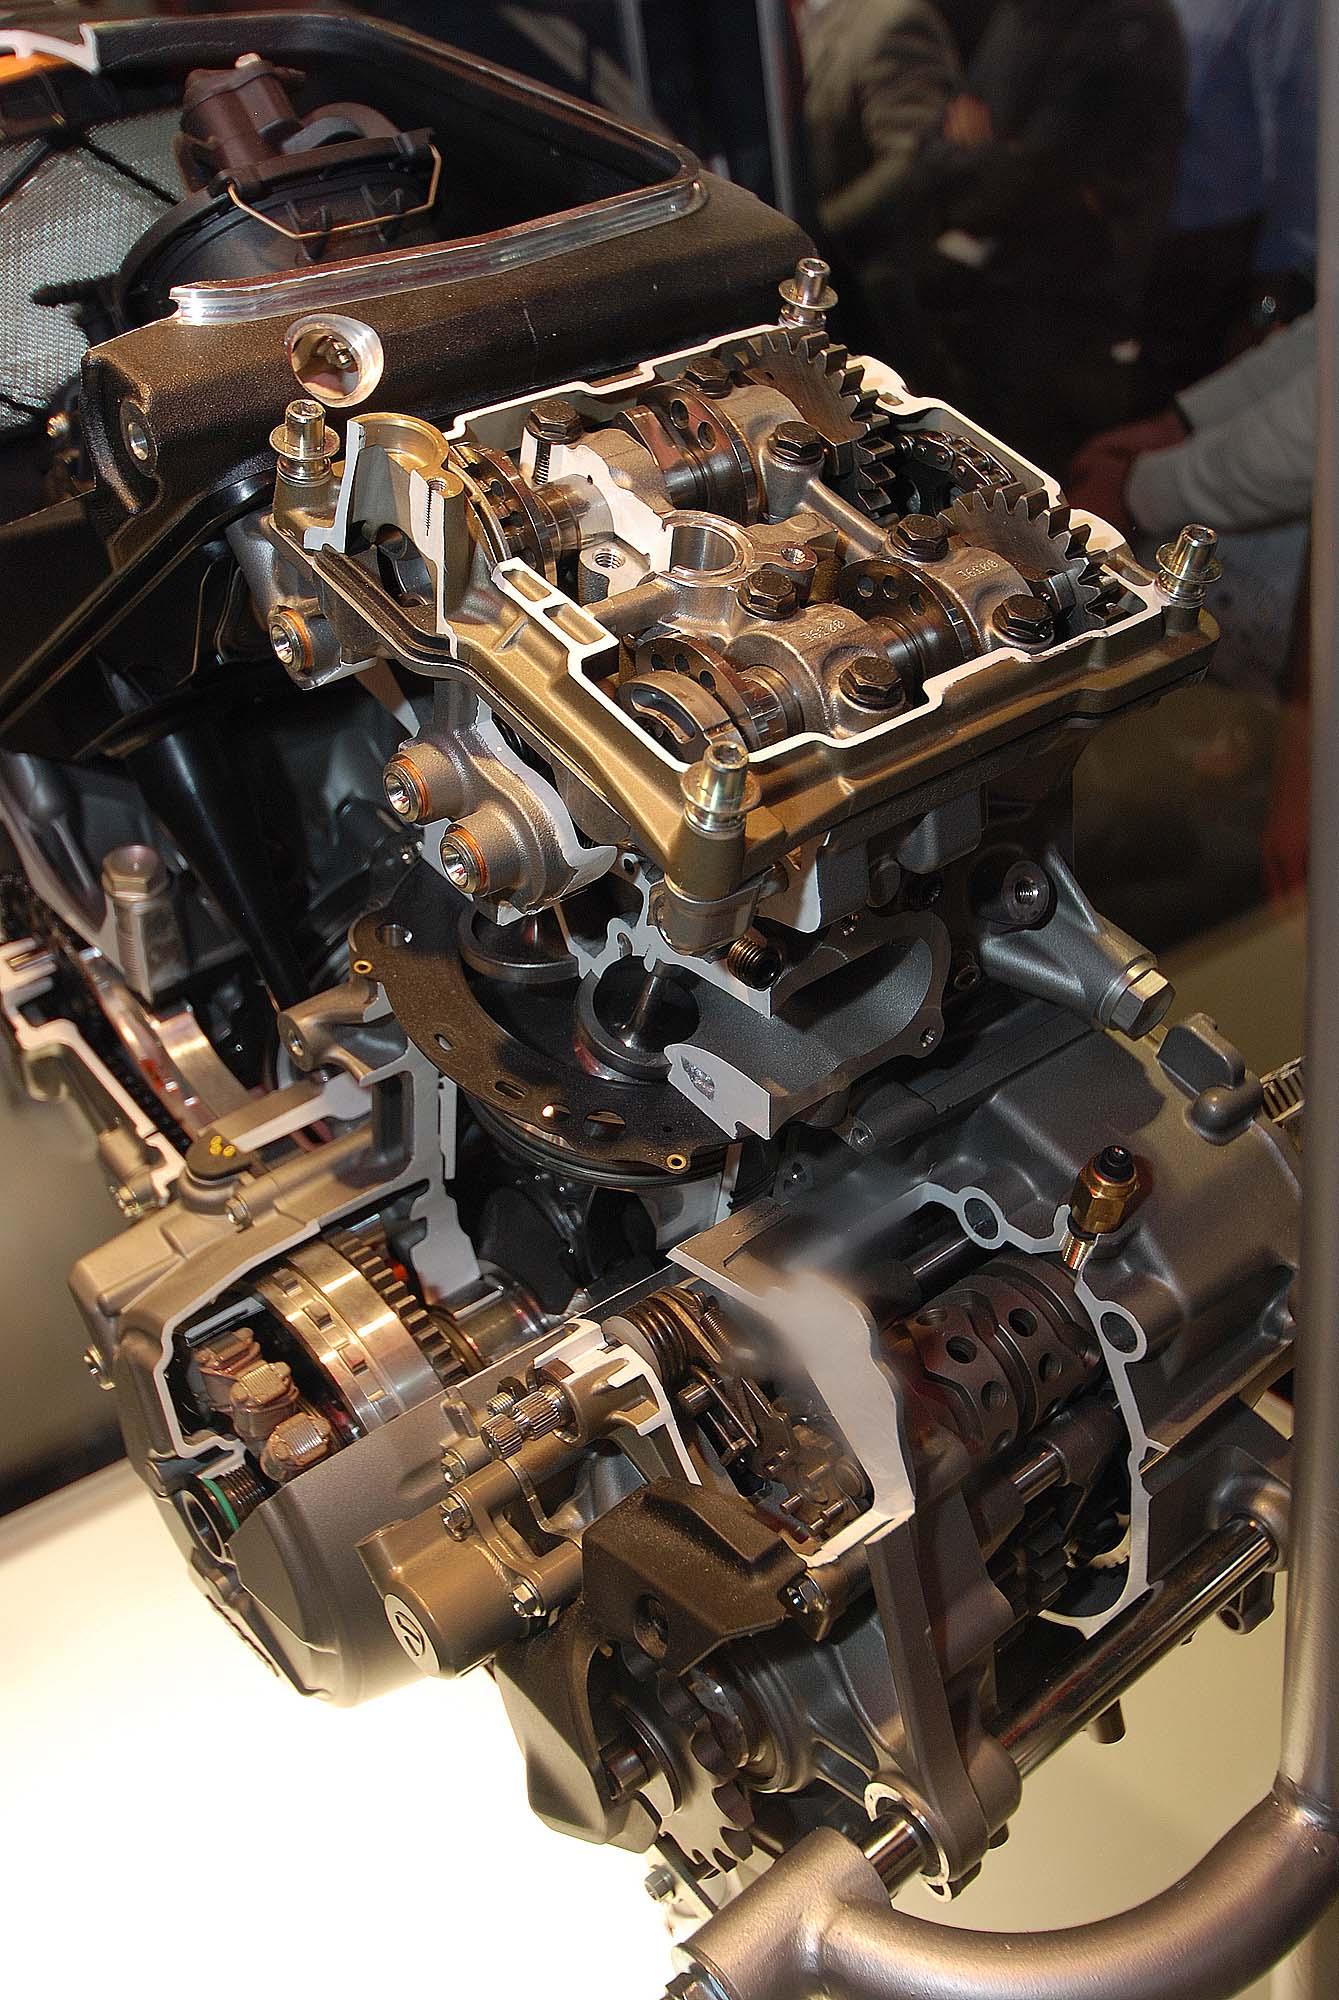 Ducati Panigale Engine Failure